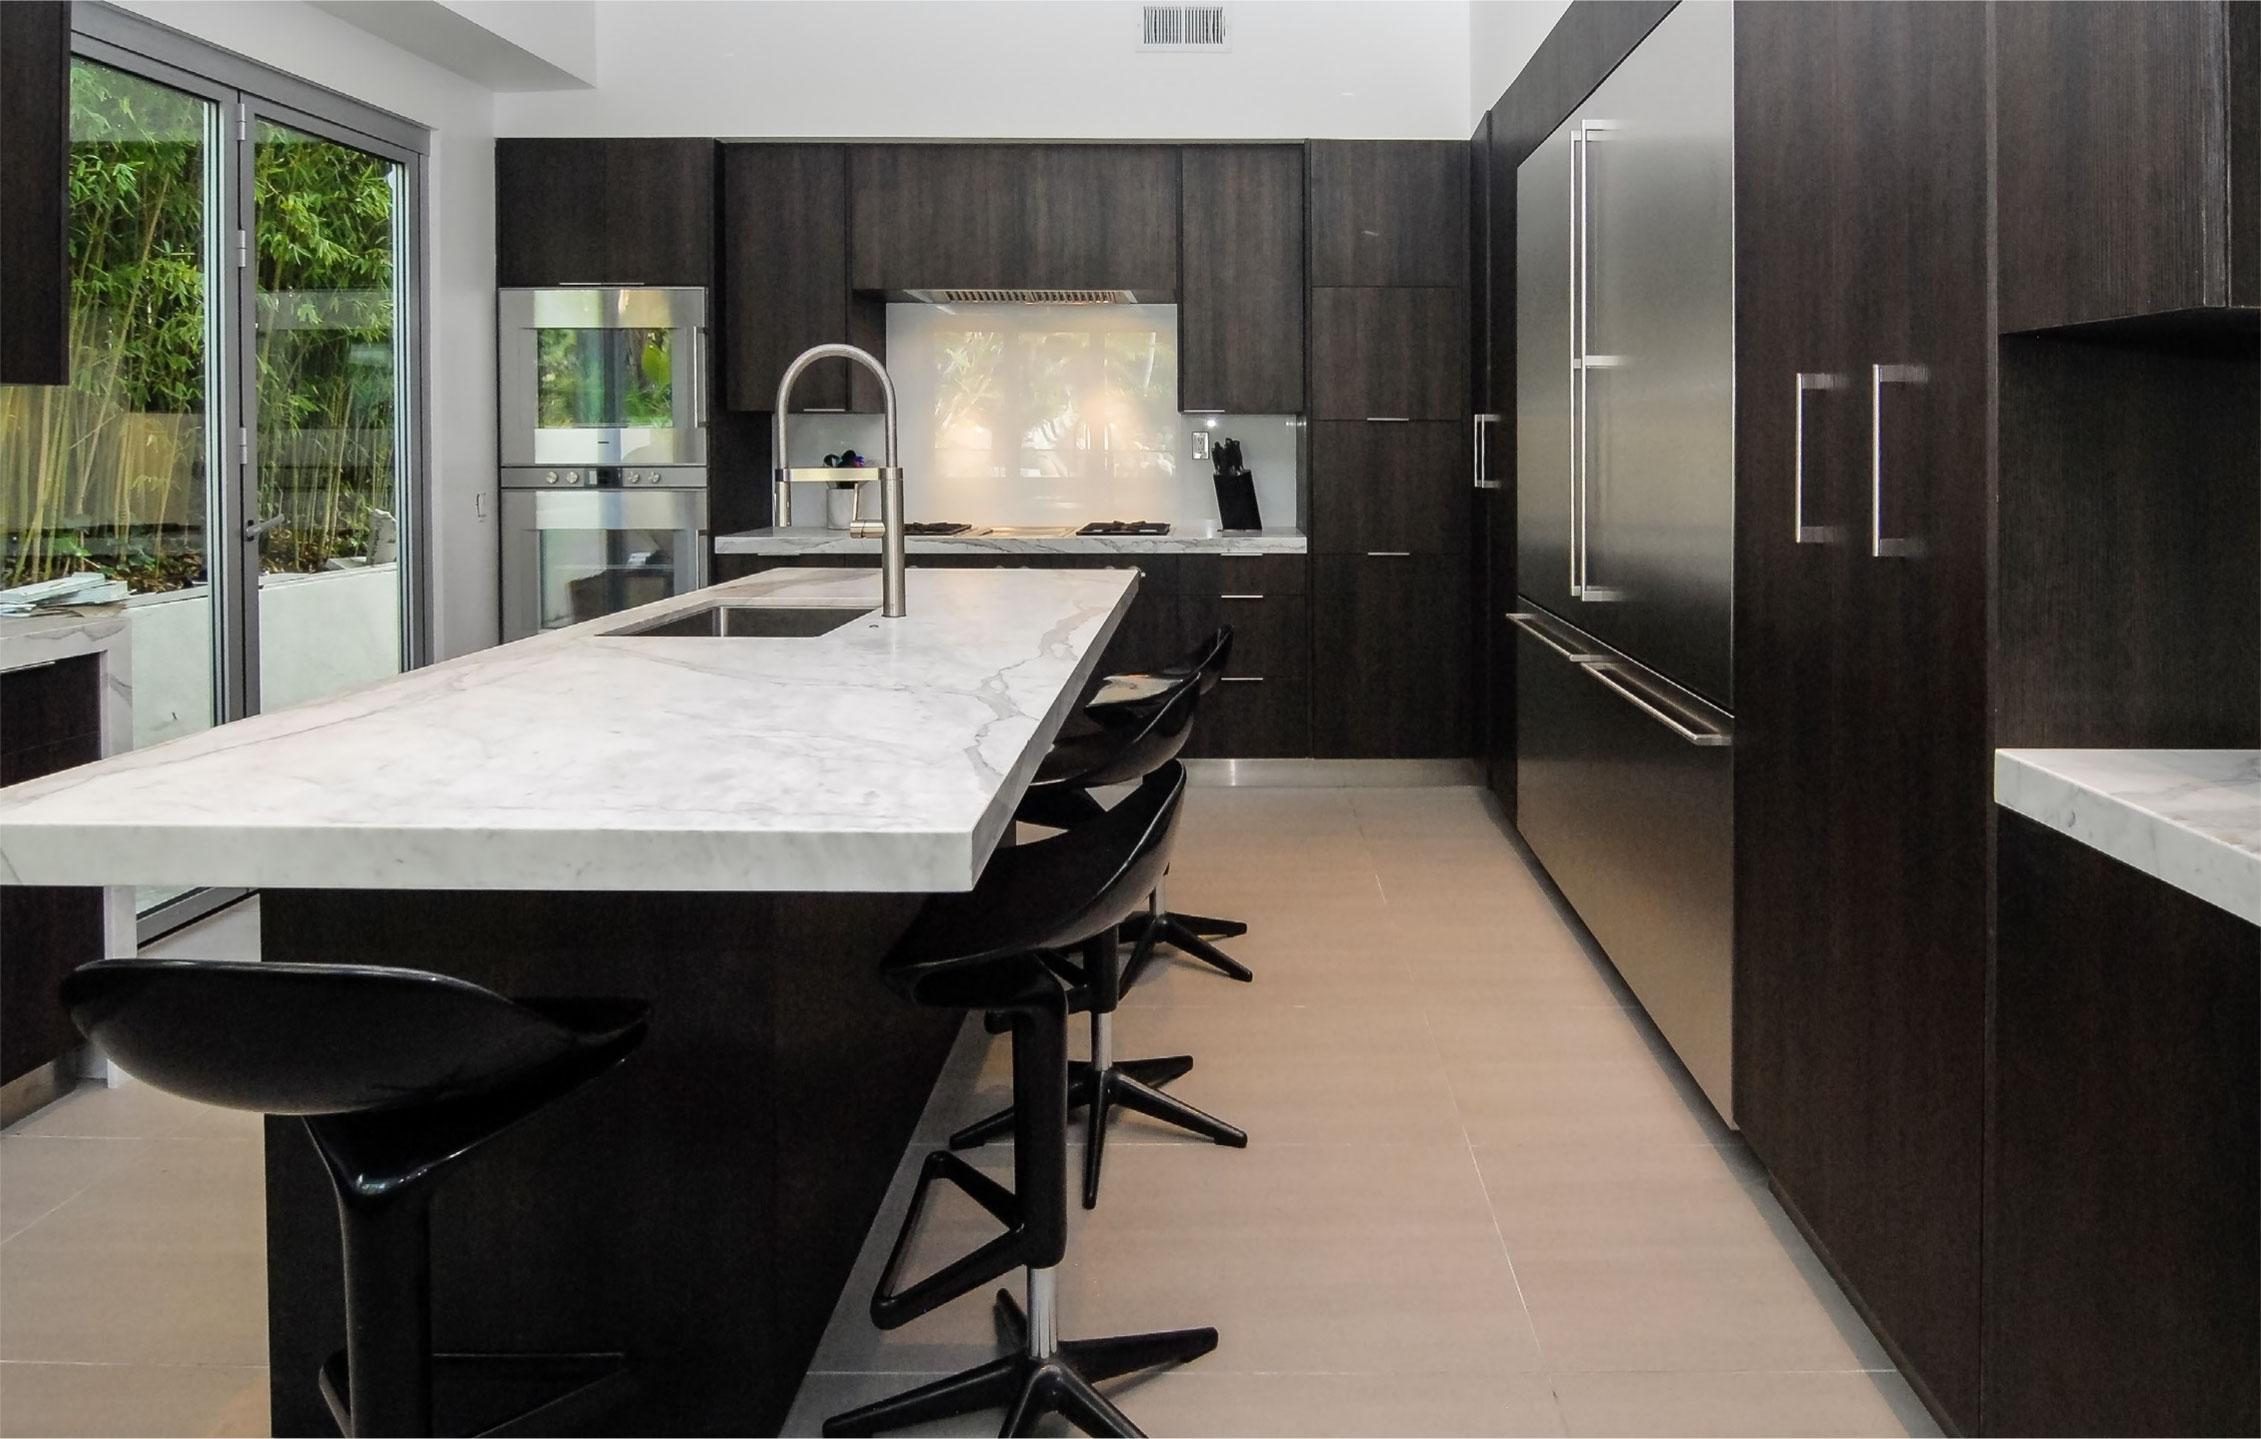 Fitucci Dark Custom Kitchen